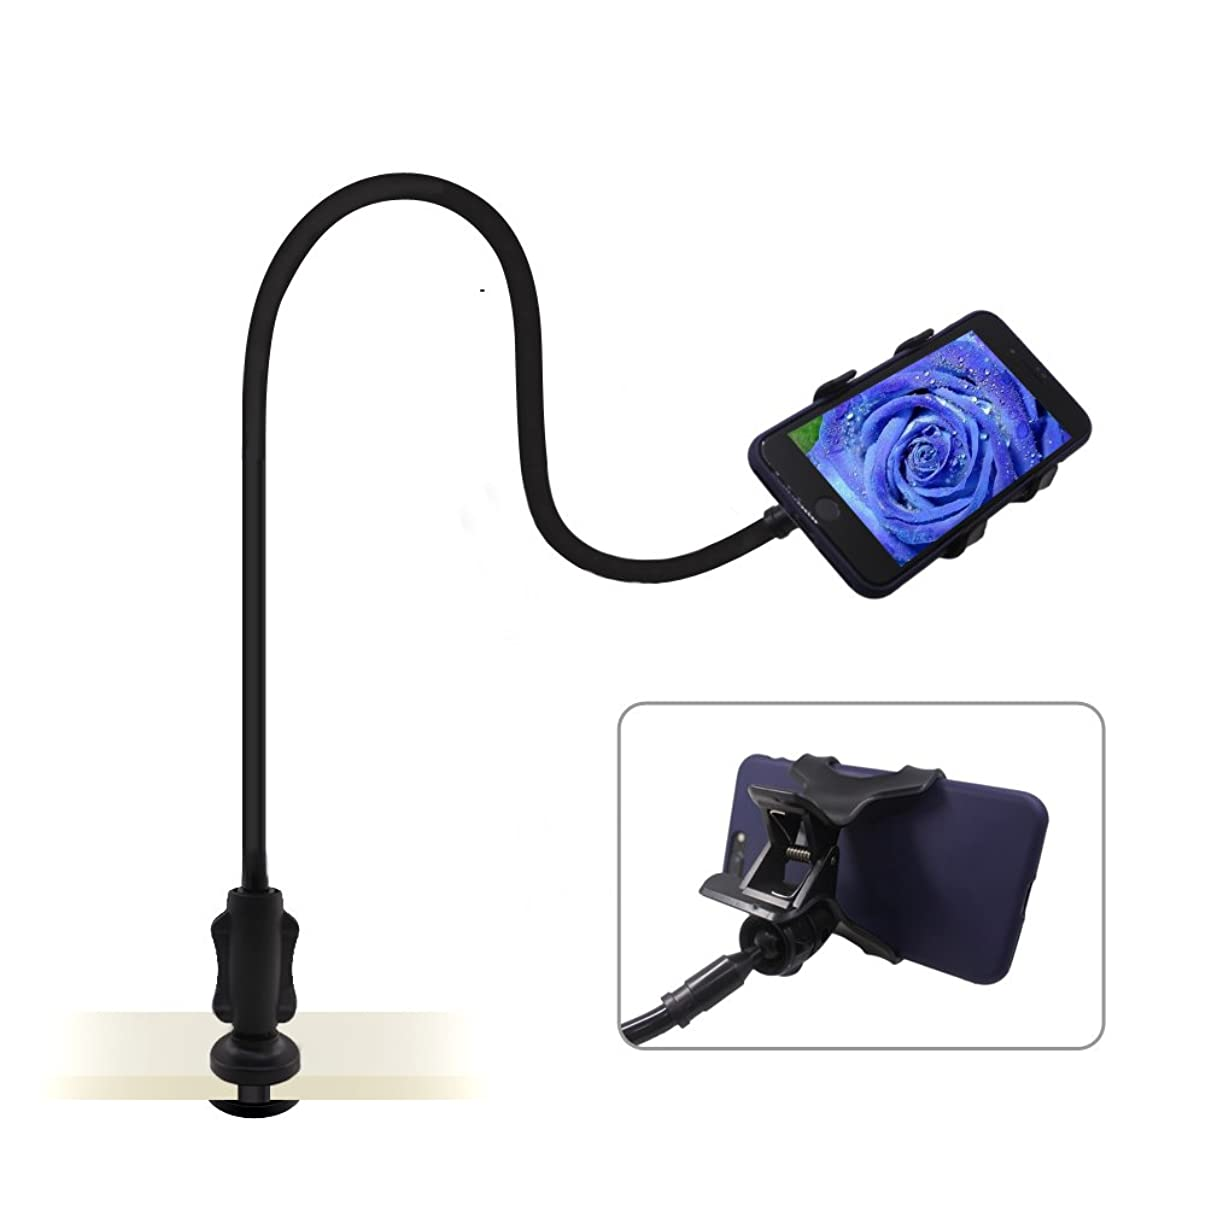 Cell Phone Holder Stand, AFUNTA Flexible Arm 360 Adjustable Universal Gooseneck Bracket Compatible iPhone Samsung Smartphone - Black